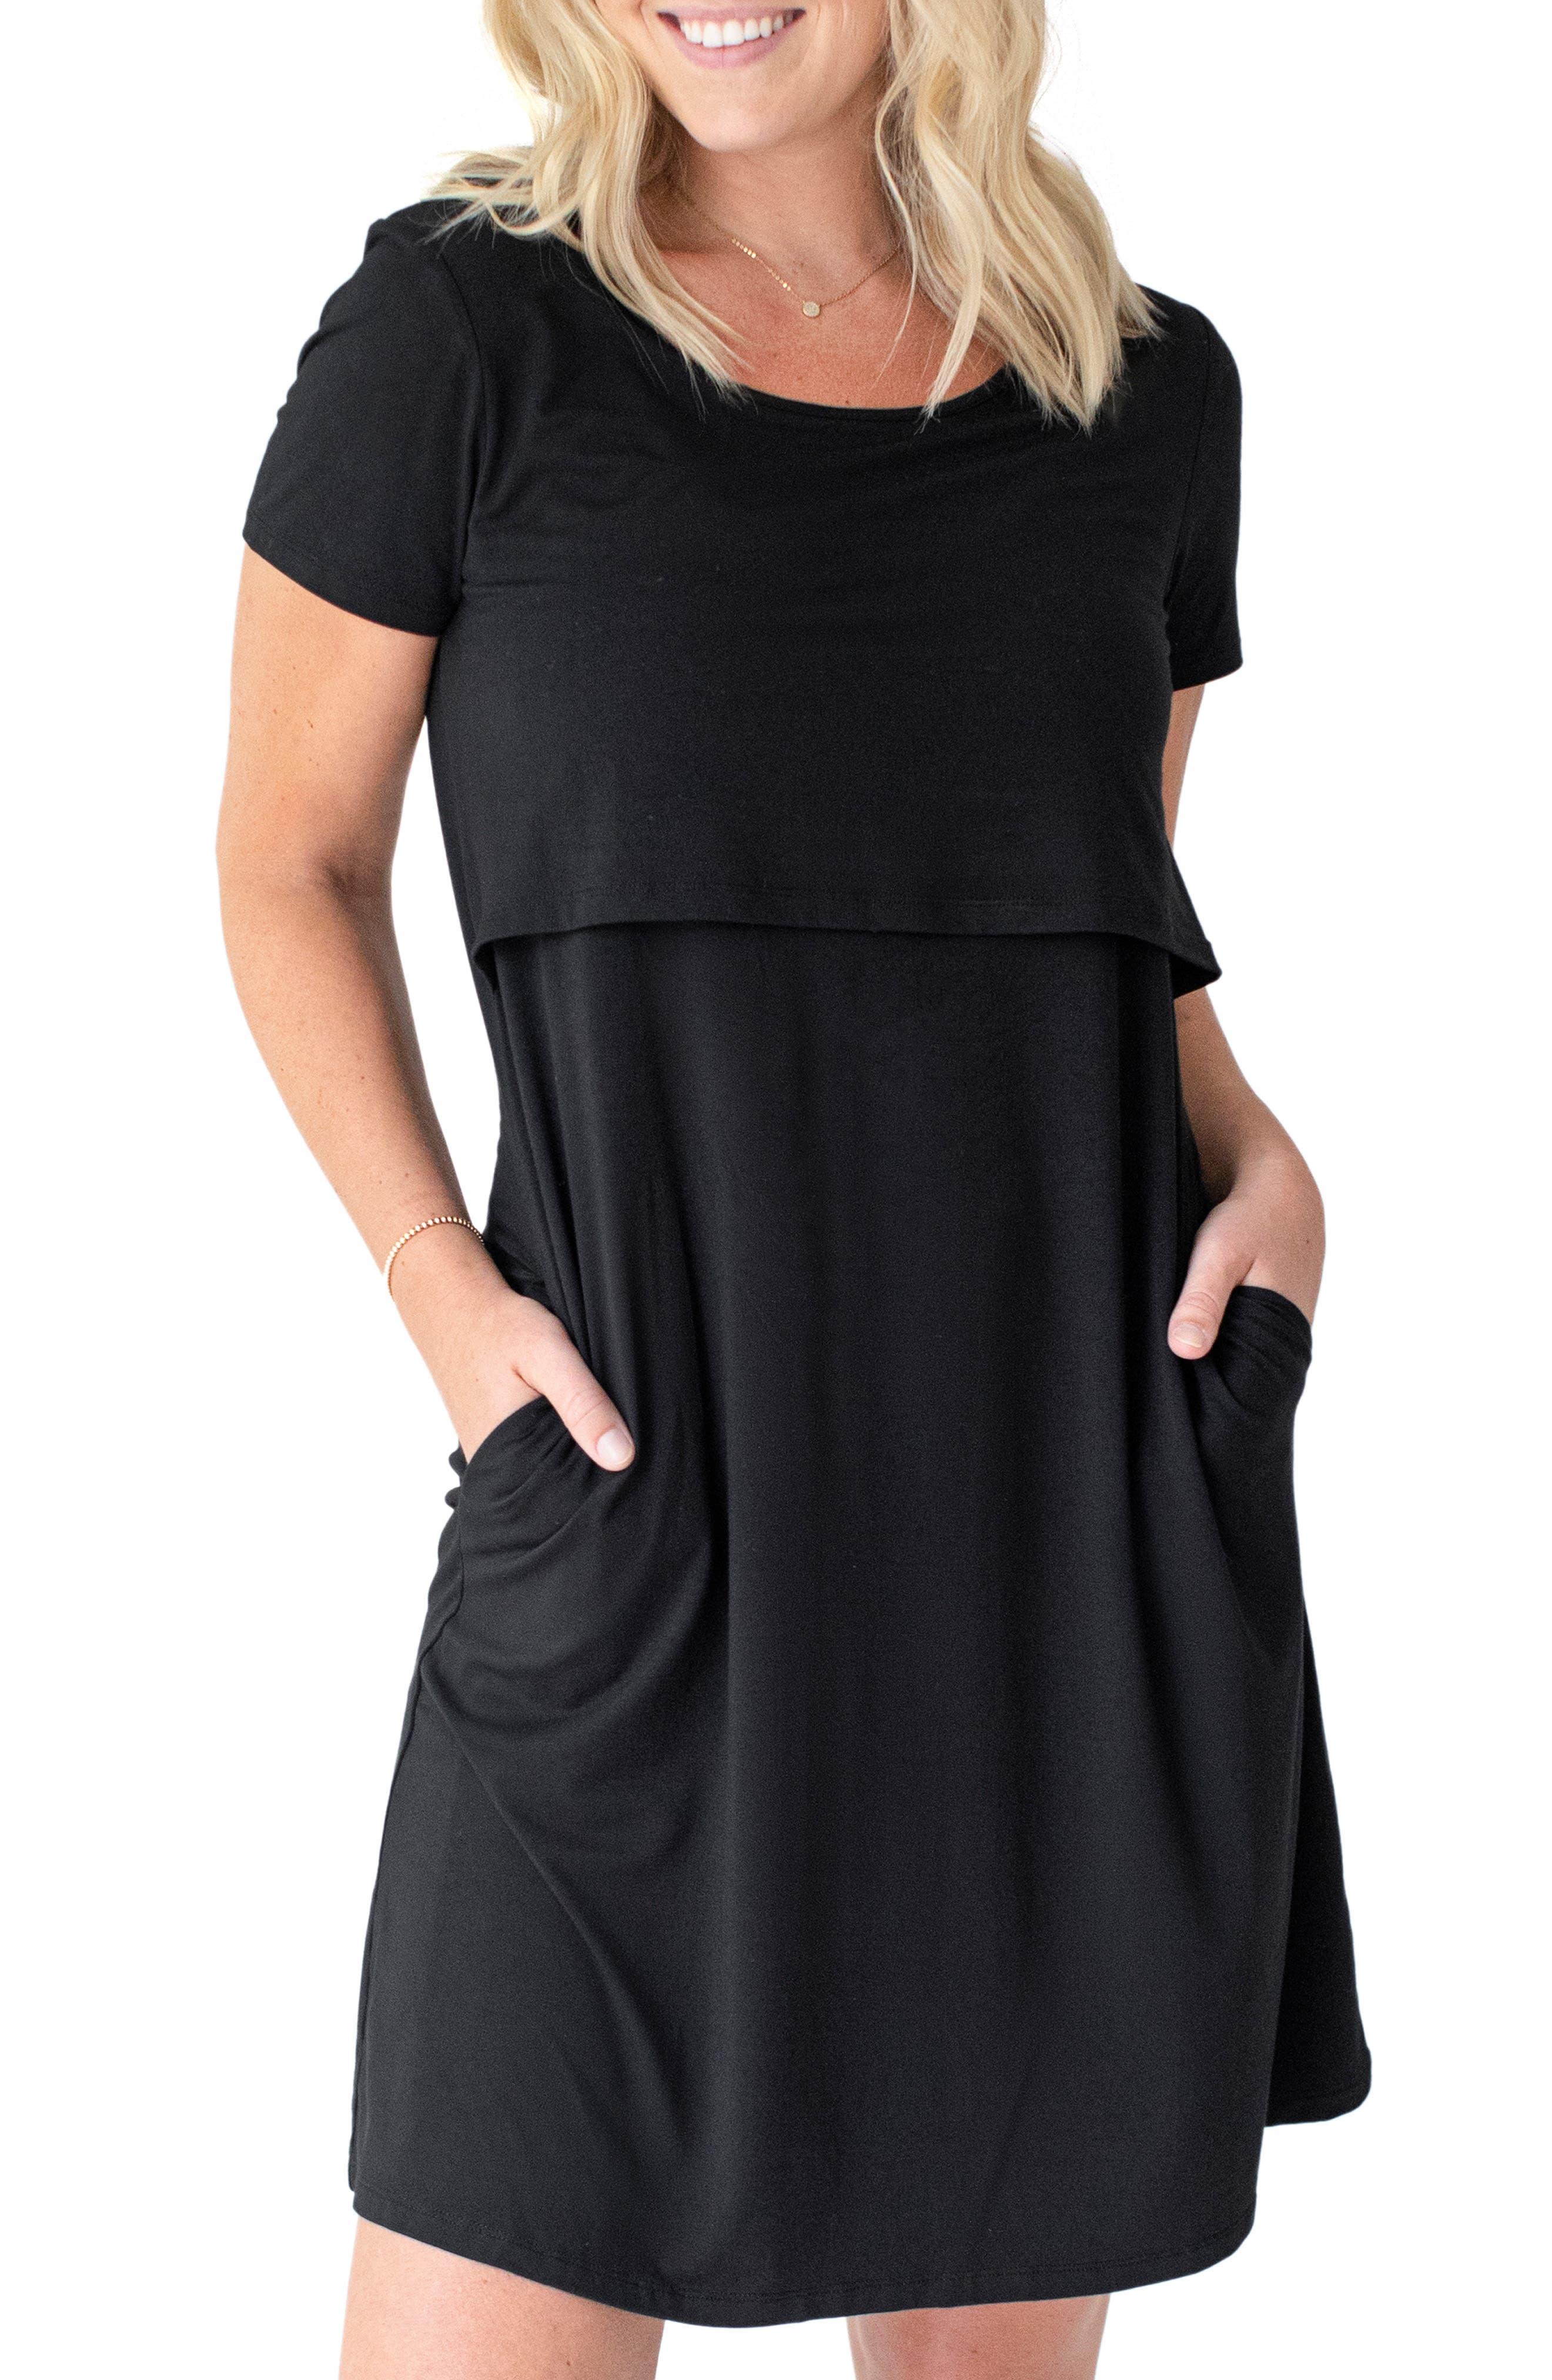 Eleanora Overlay Maternity/nursing Sleep Shirt